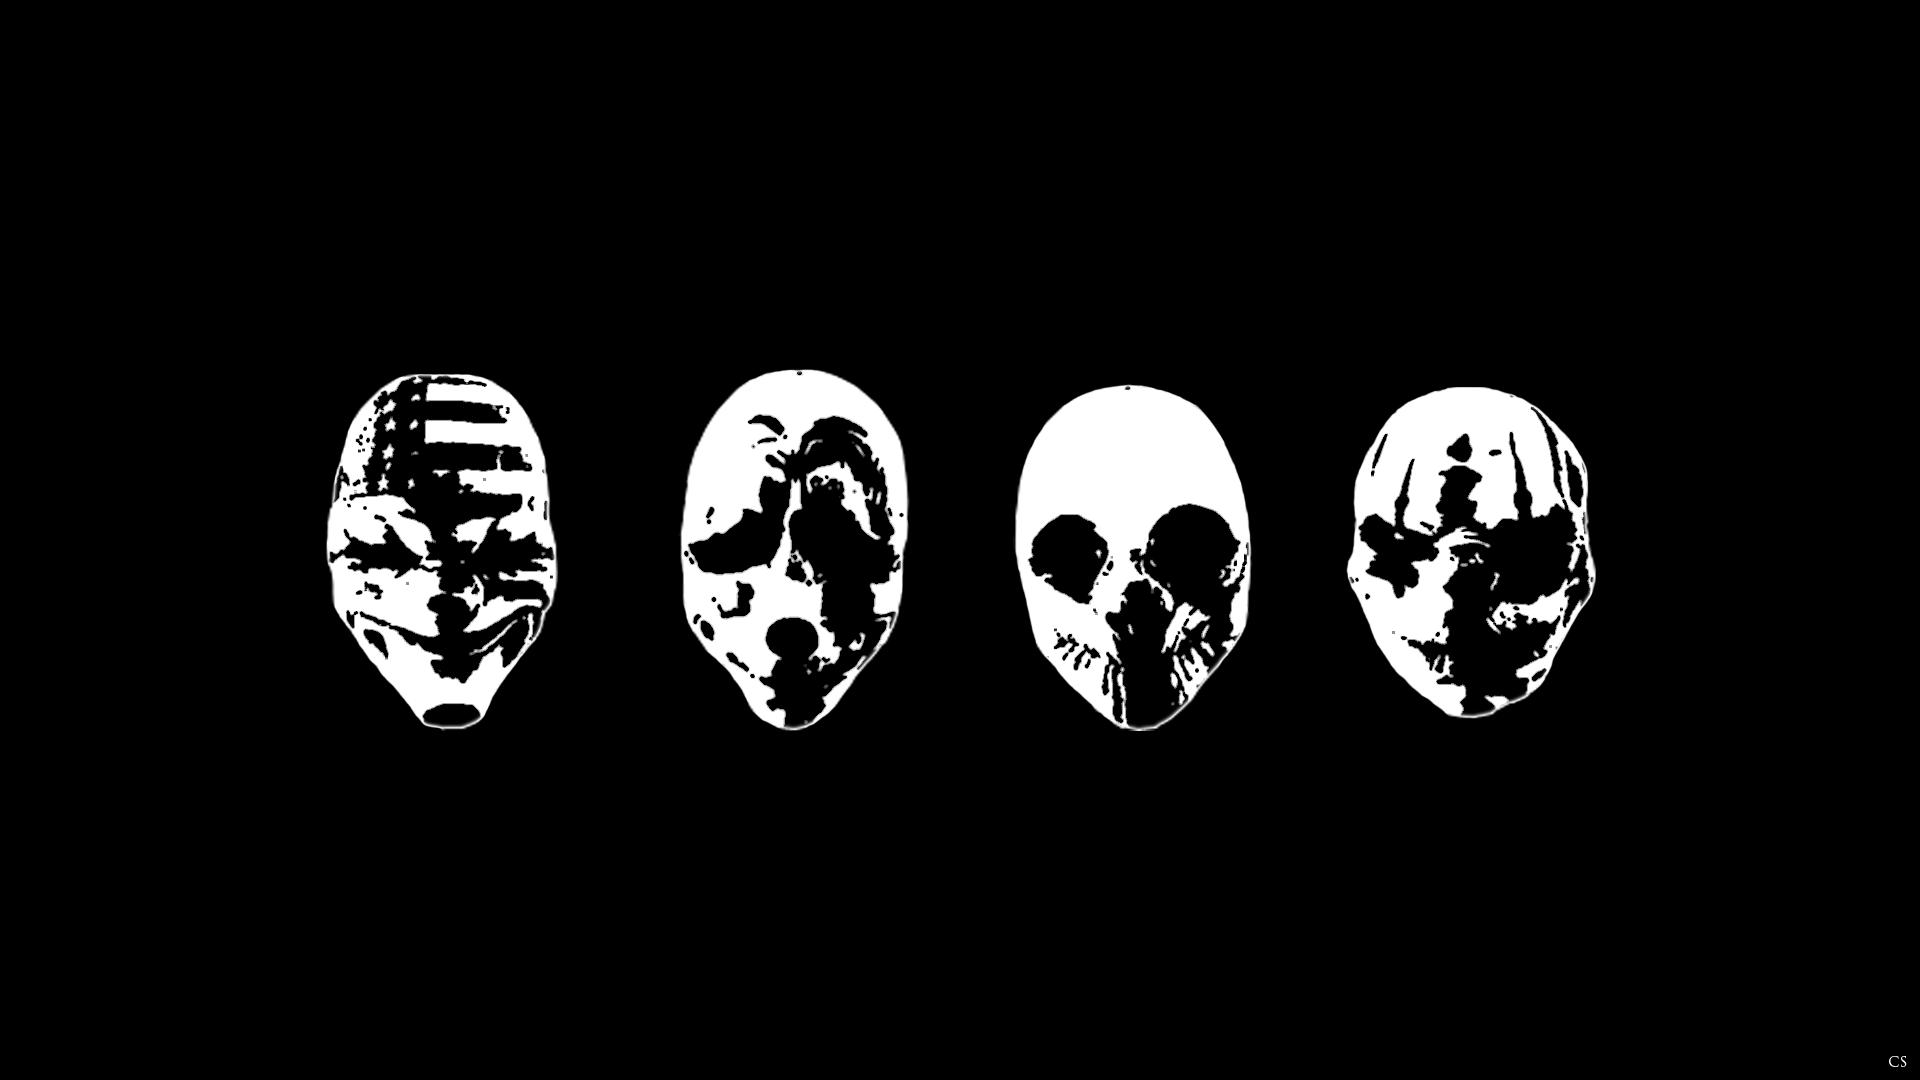 Wallpaper : illustration, video games, mask, text, logo, PC gaming